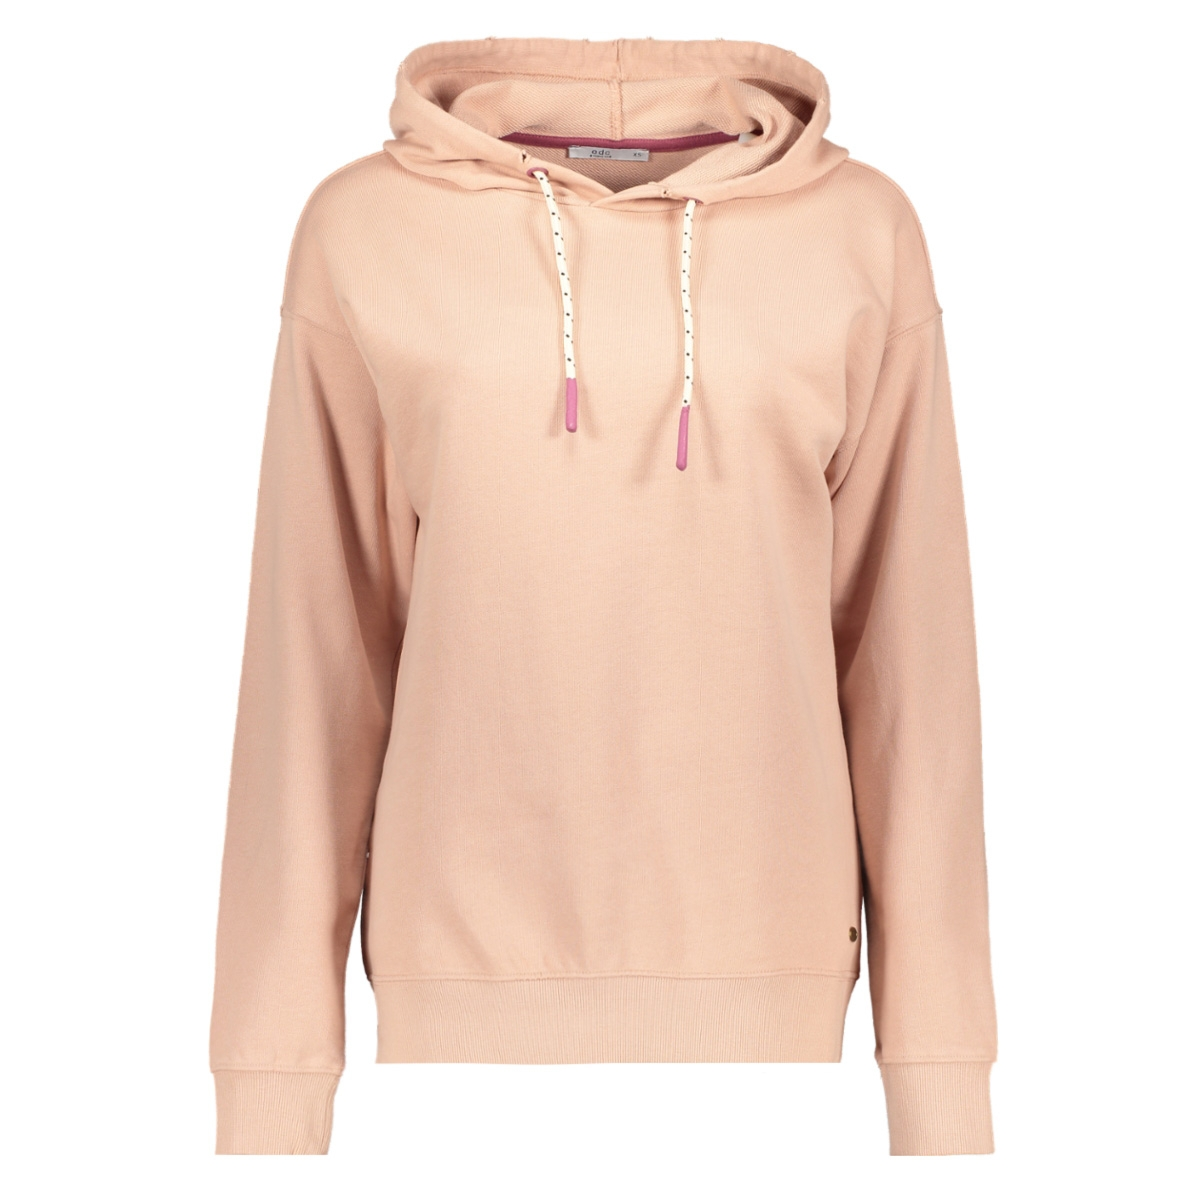 029cc1j003 edc sweater c680